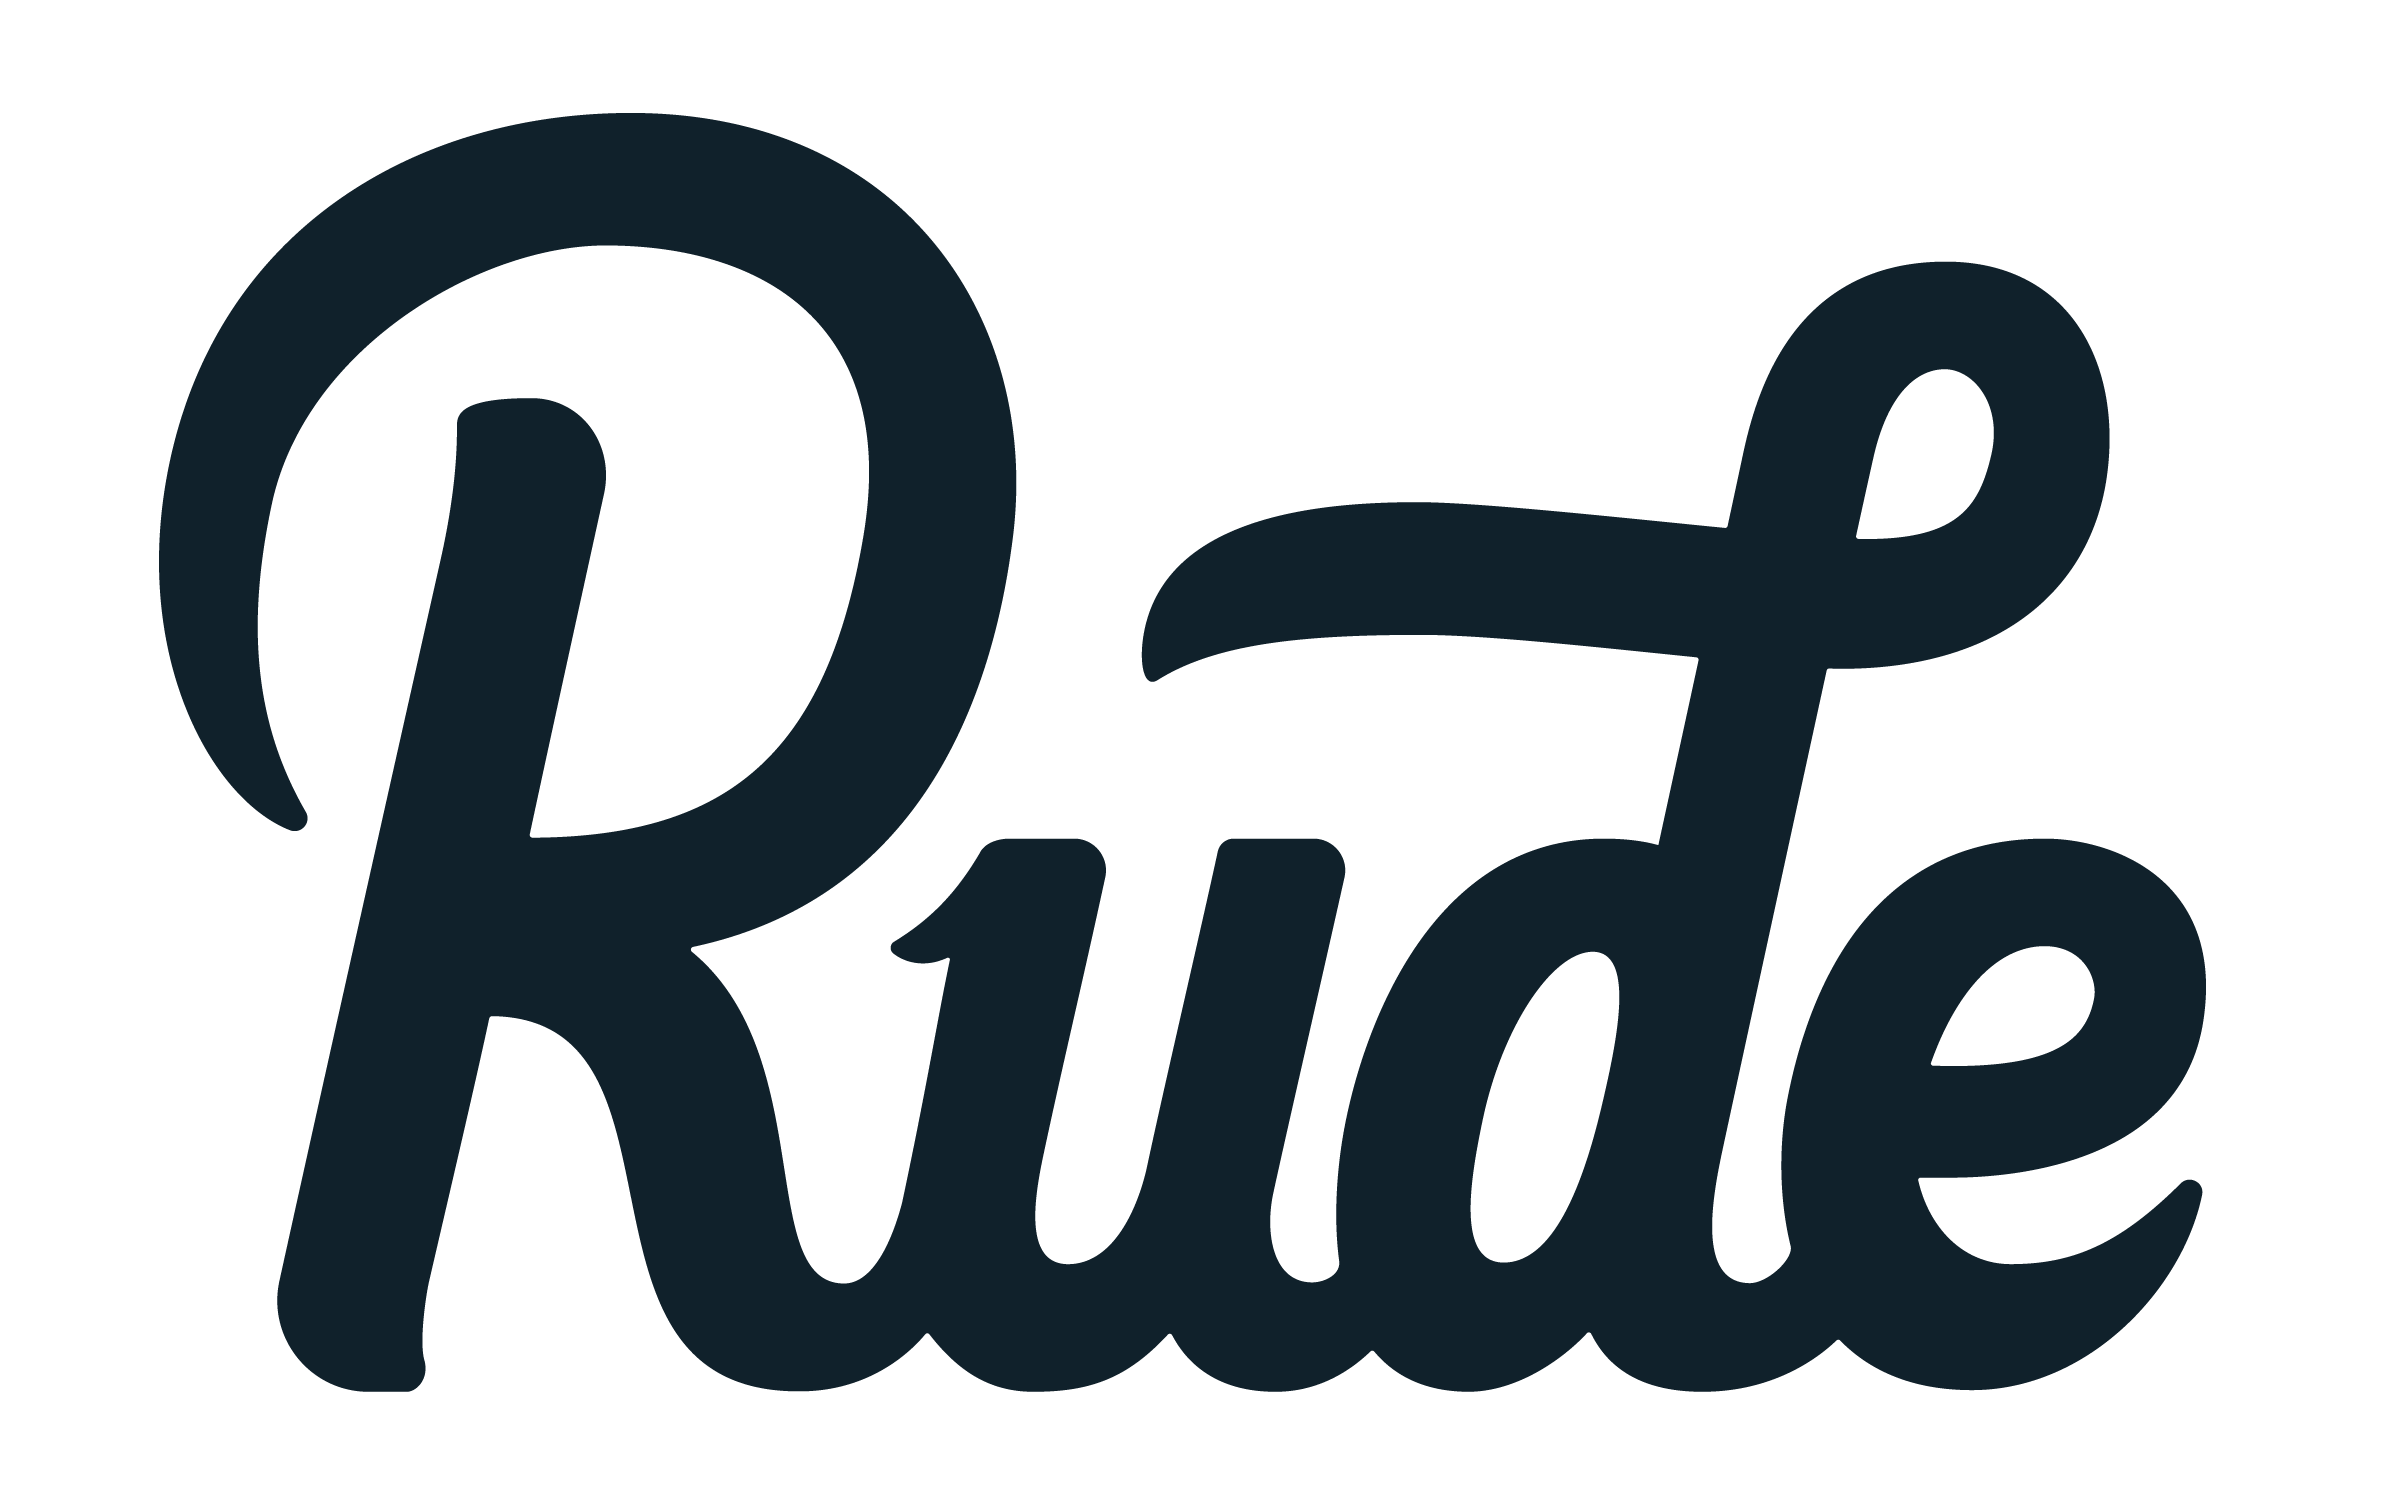 Bryan Rude